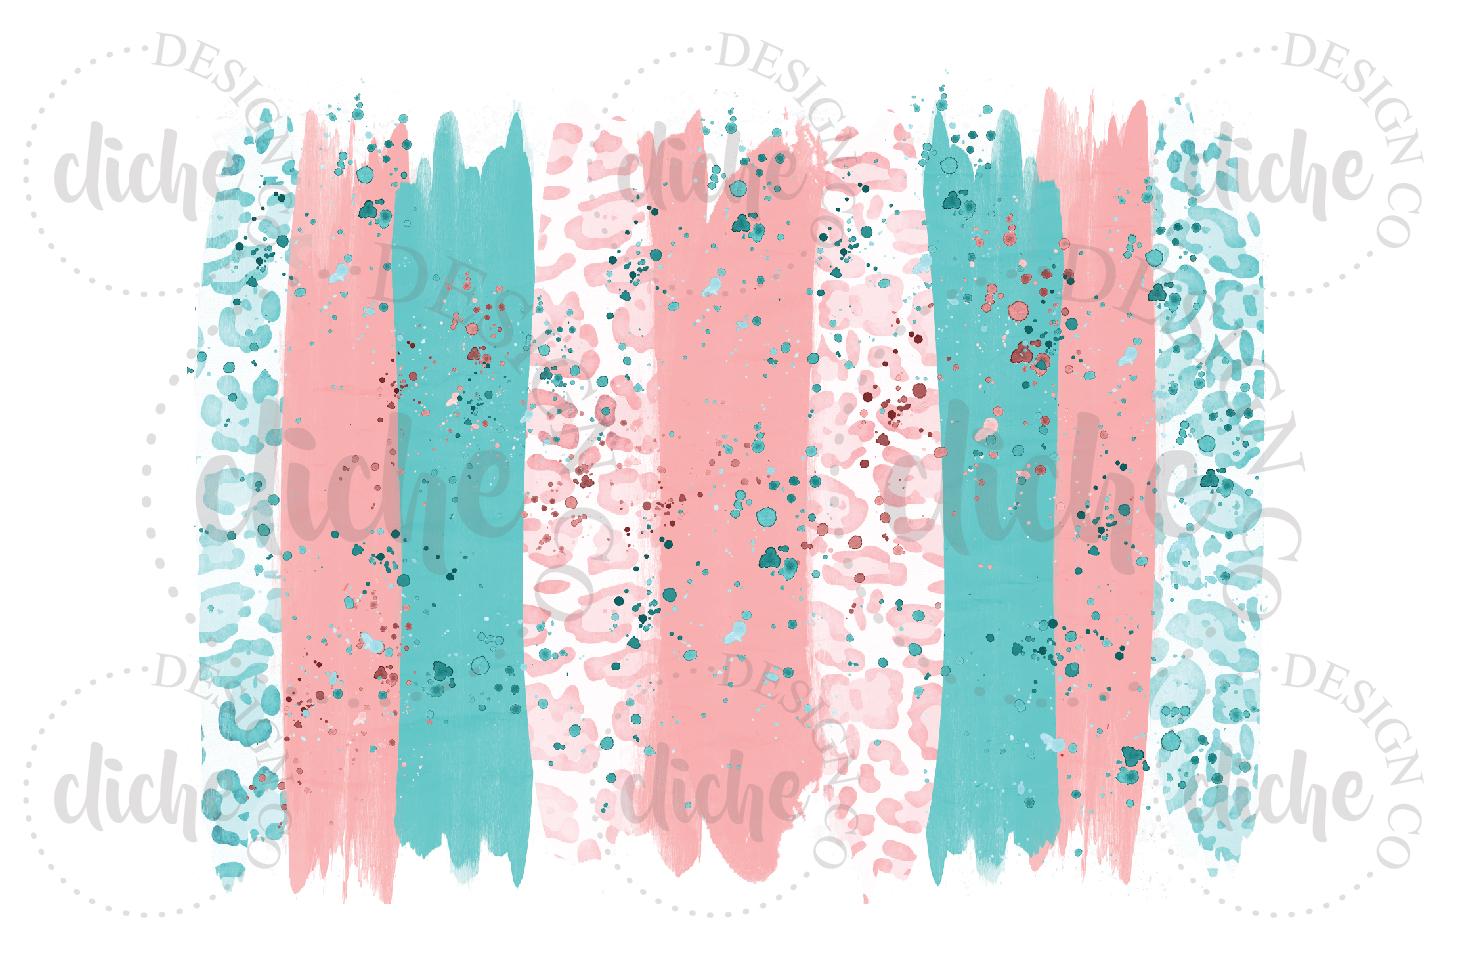 Spring Paint Stroke Sublimation Design Background example image 1